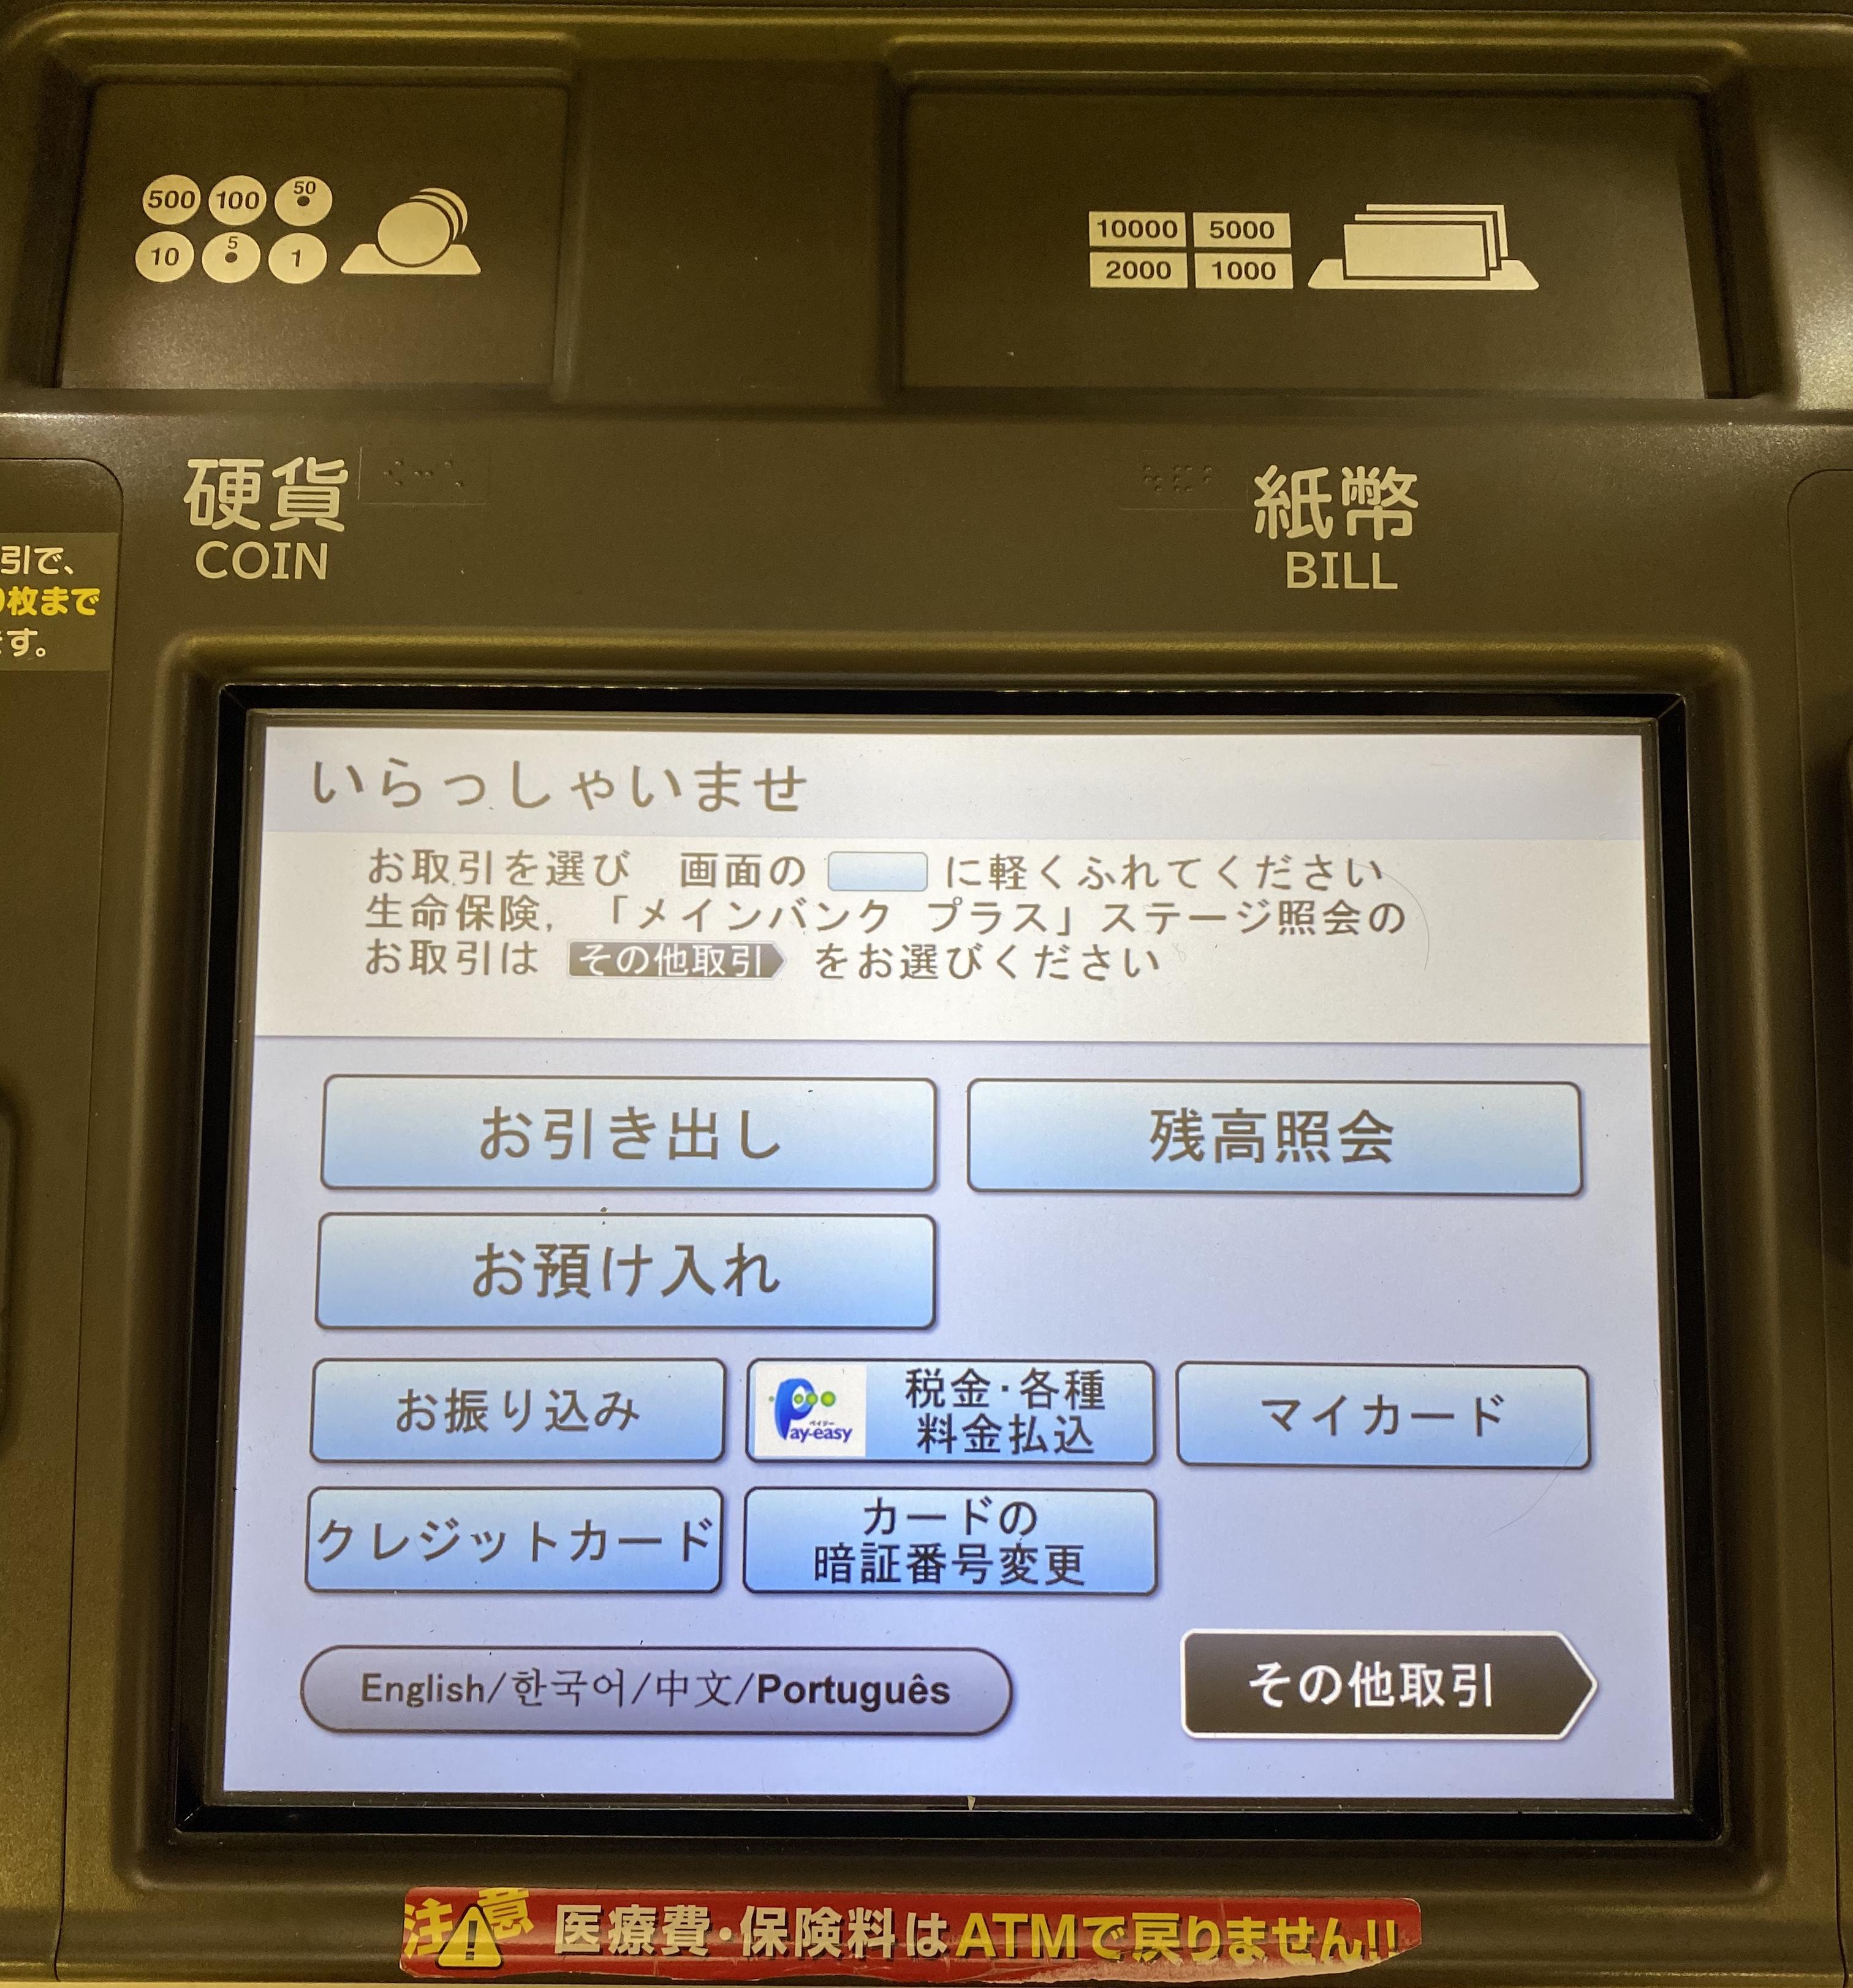 ATM screen!